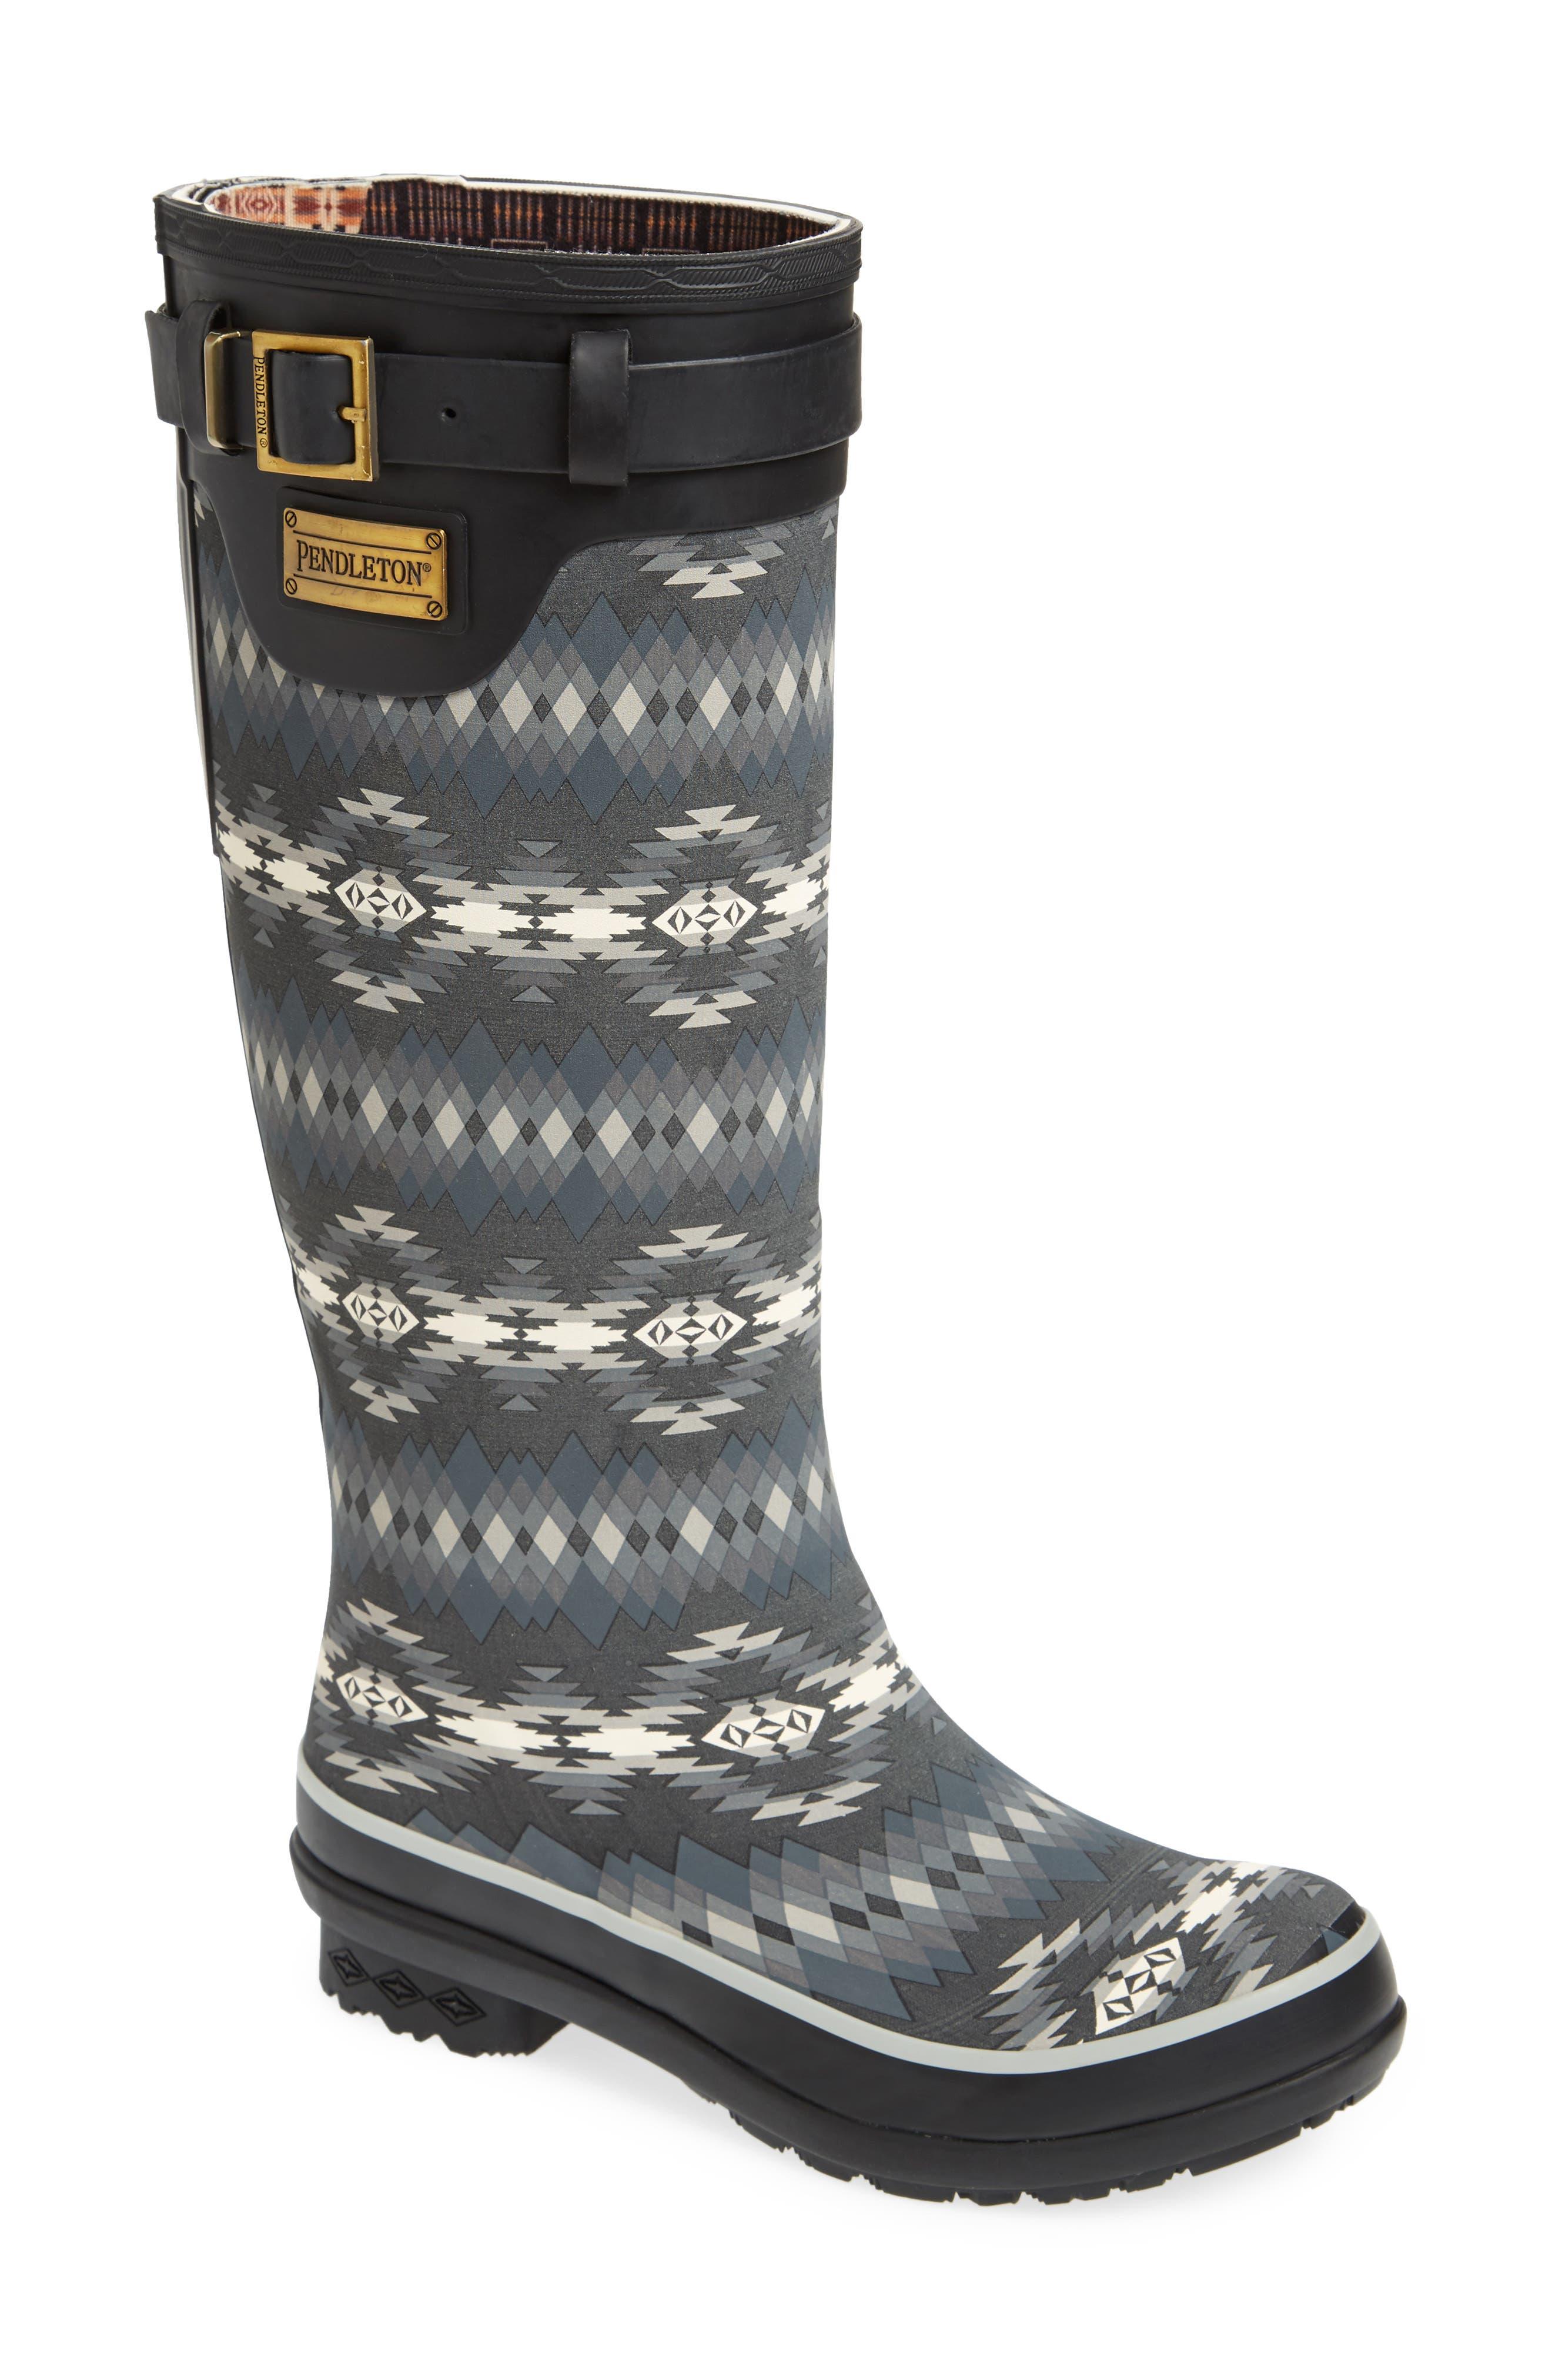 Main Image - Pendleton Papago Park Tall Rain Boot (Women)